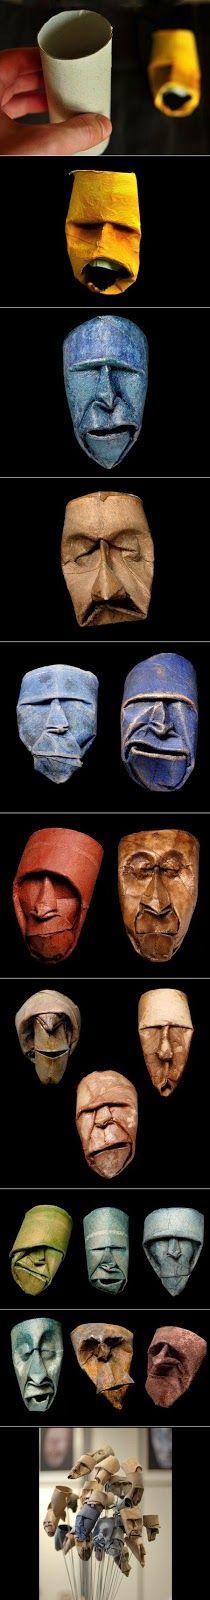 Brilliant masks out of toilet rolls Toilet Paper Roll Art, Rolled Paper Art, Toilet Art, Recycled Art, Art Plastique, Teaching Art, Elementary Art, Art Techniques, Diy Paper